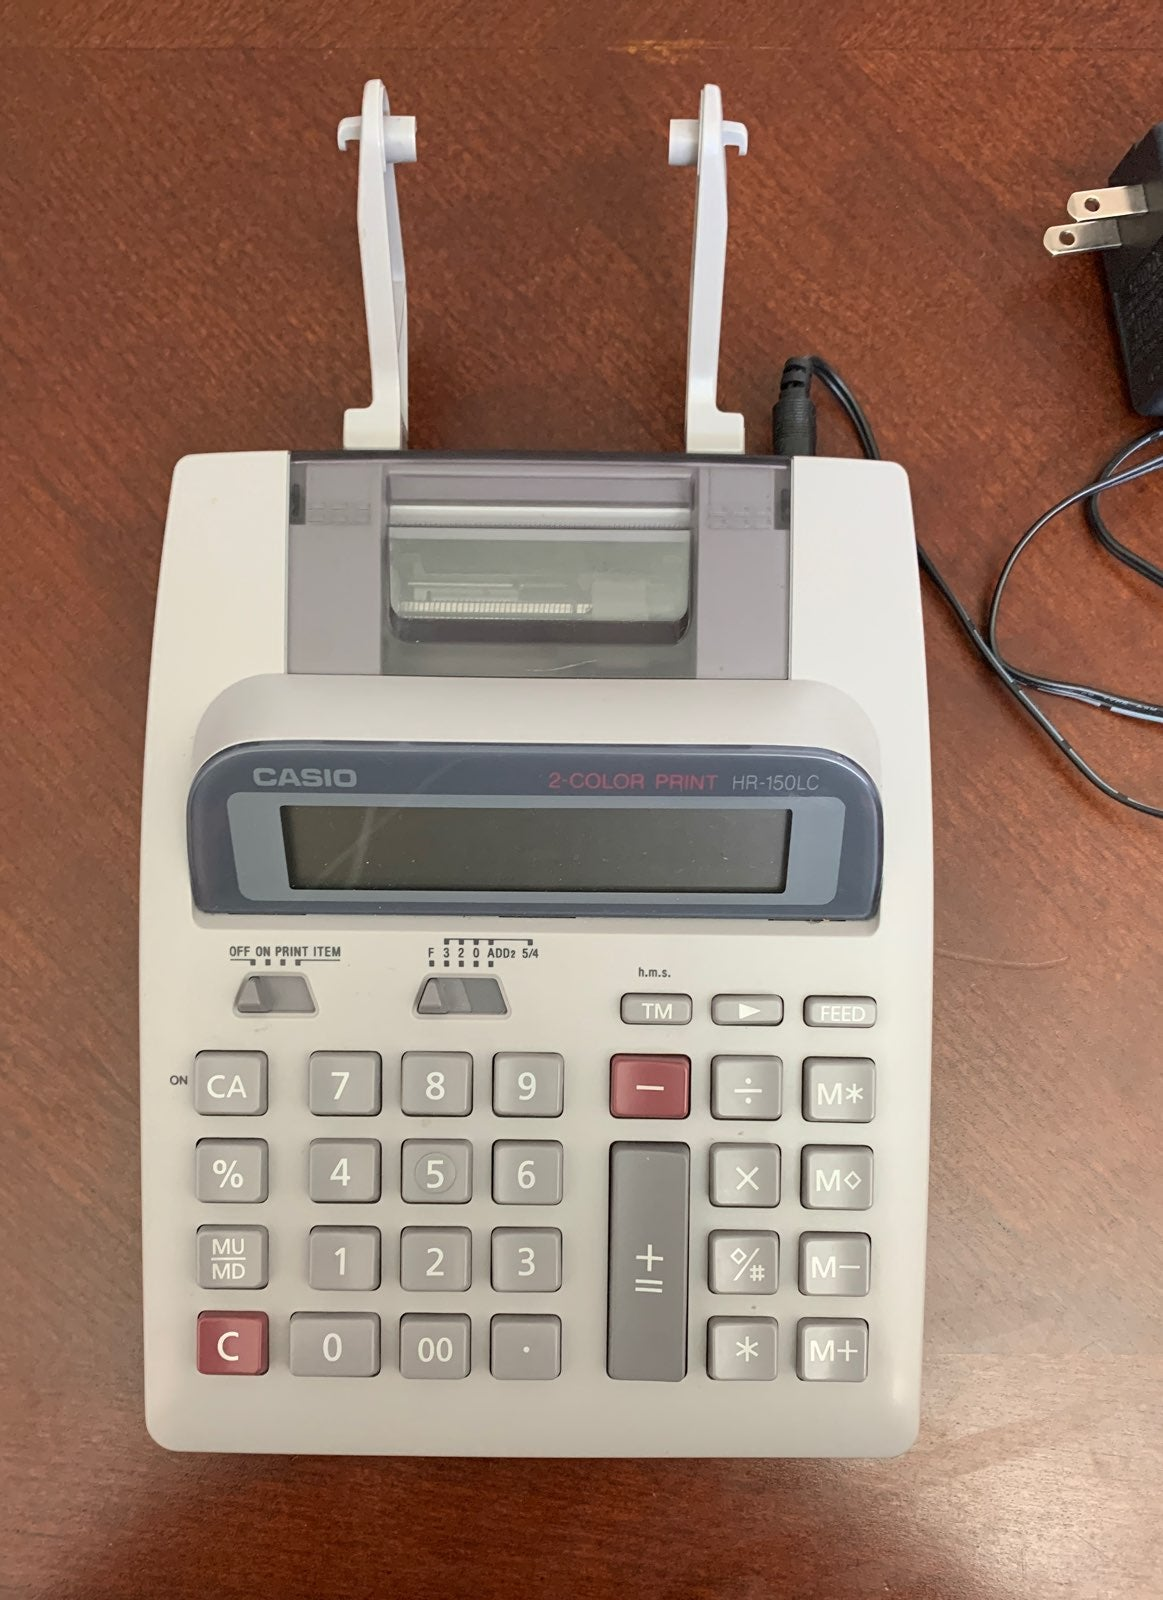 Casio calculator adding machine 2 color